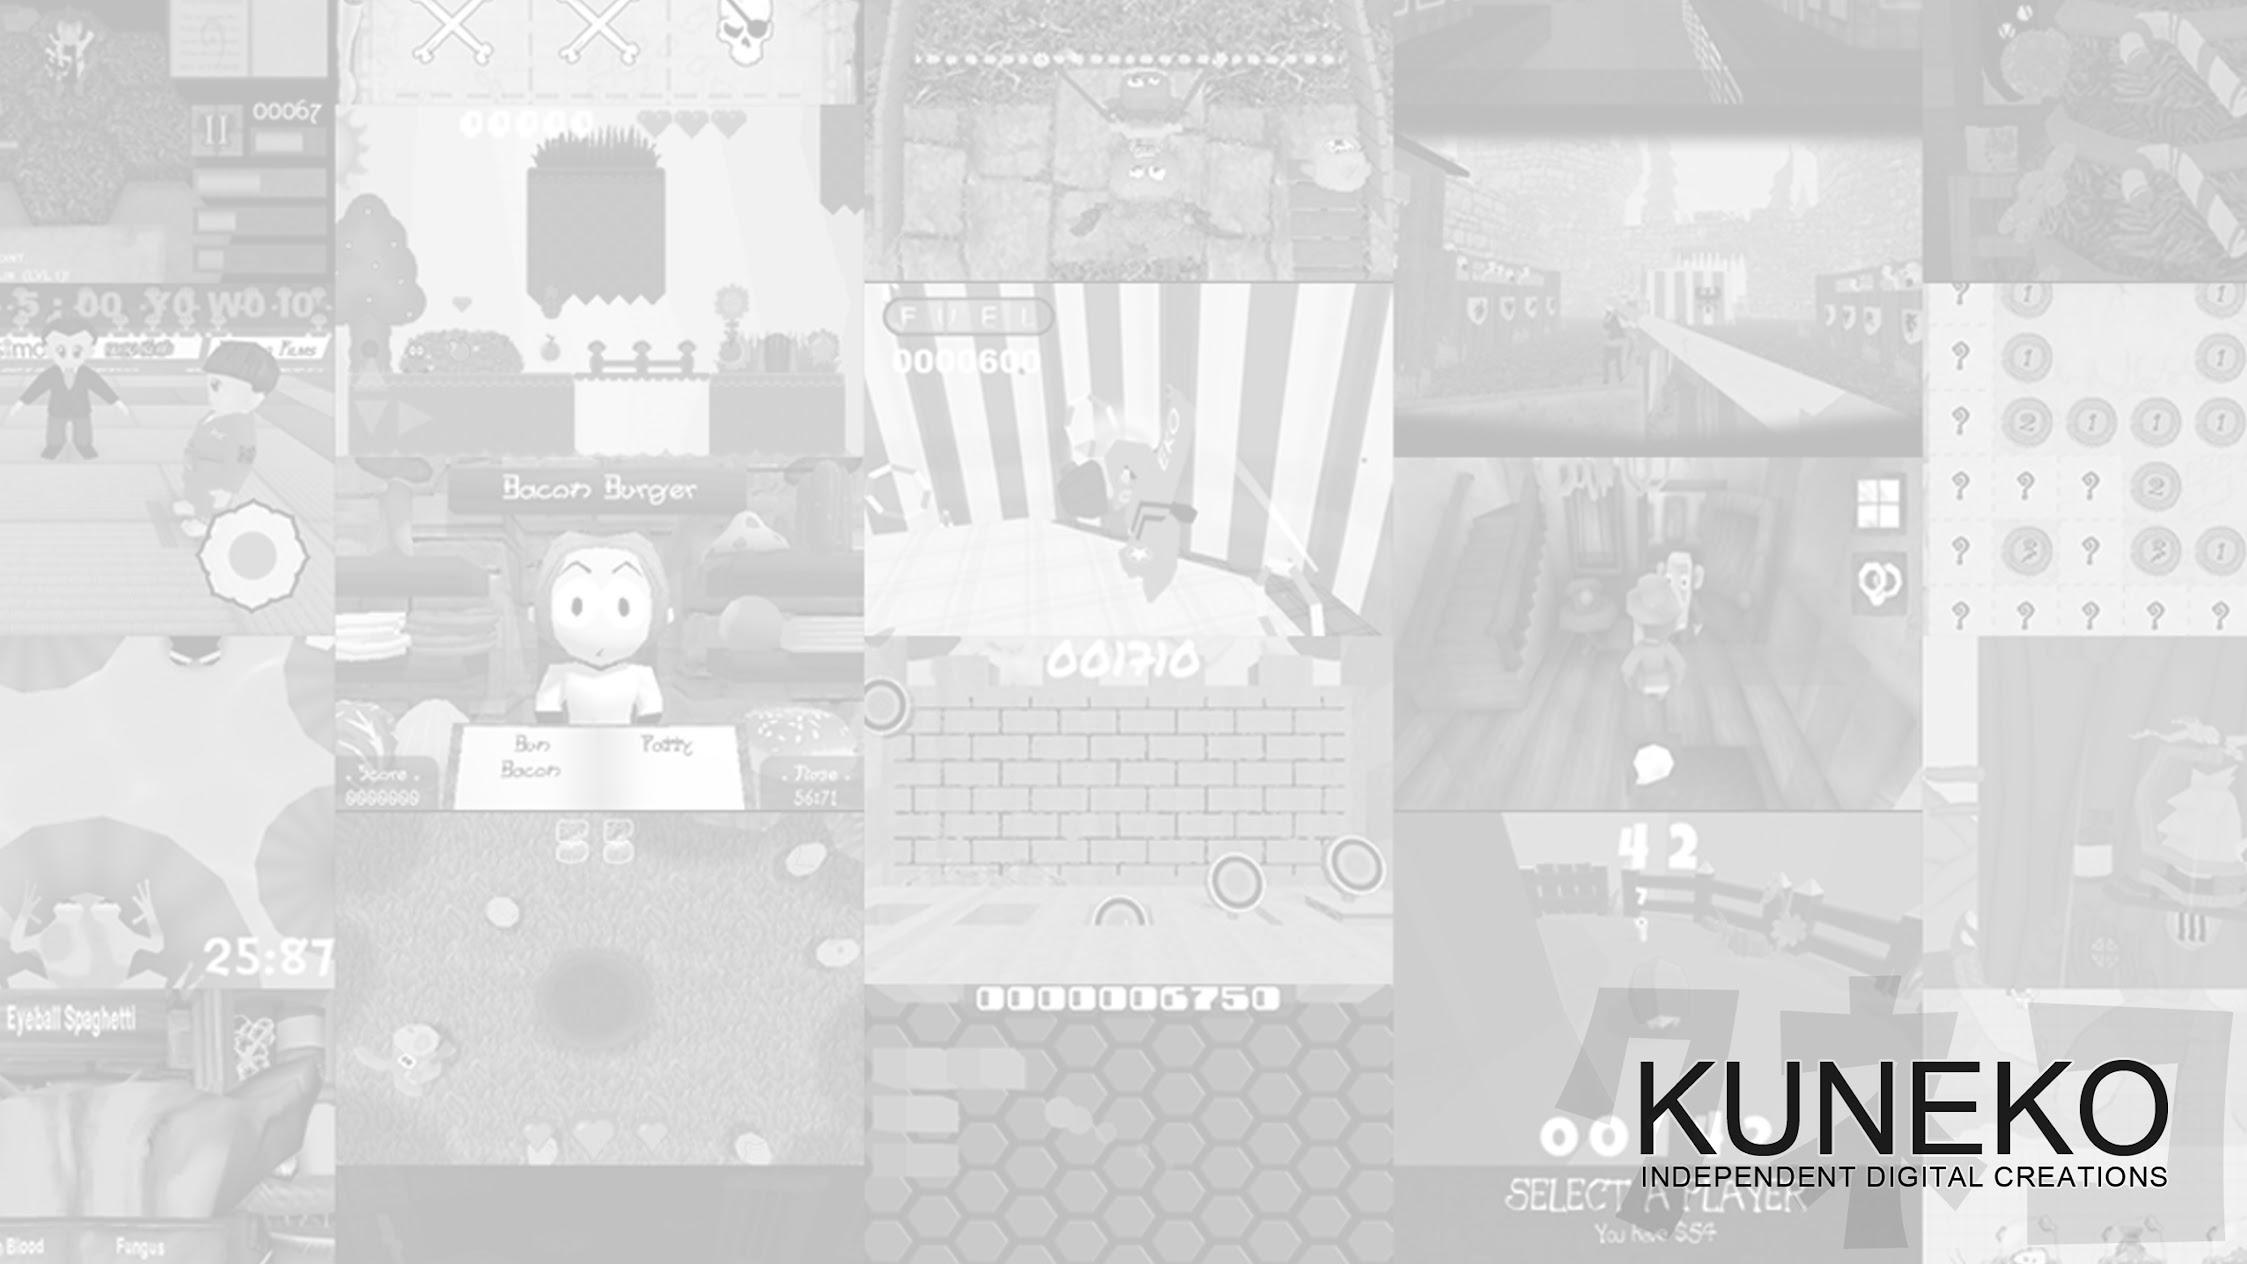 Kuneko